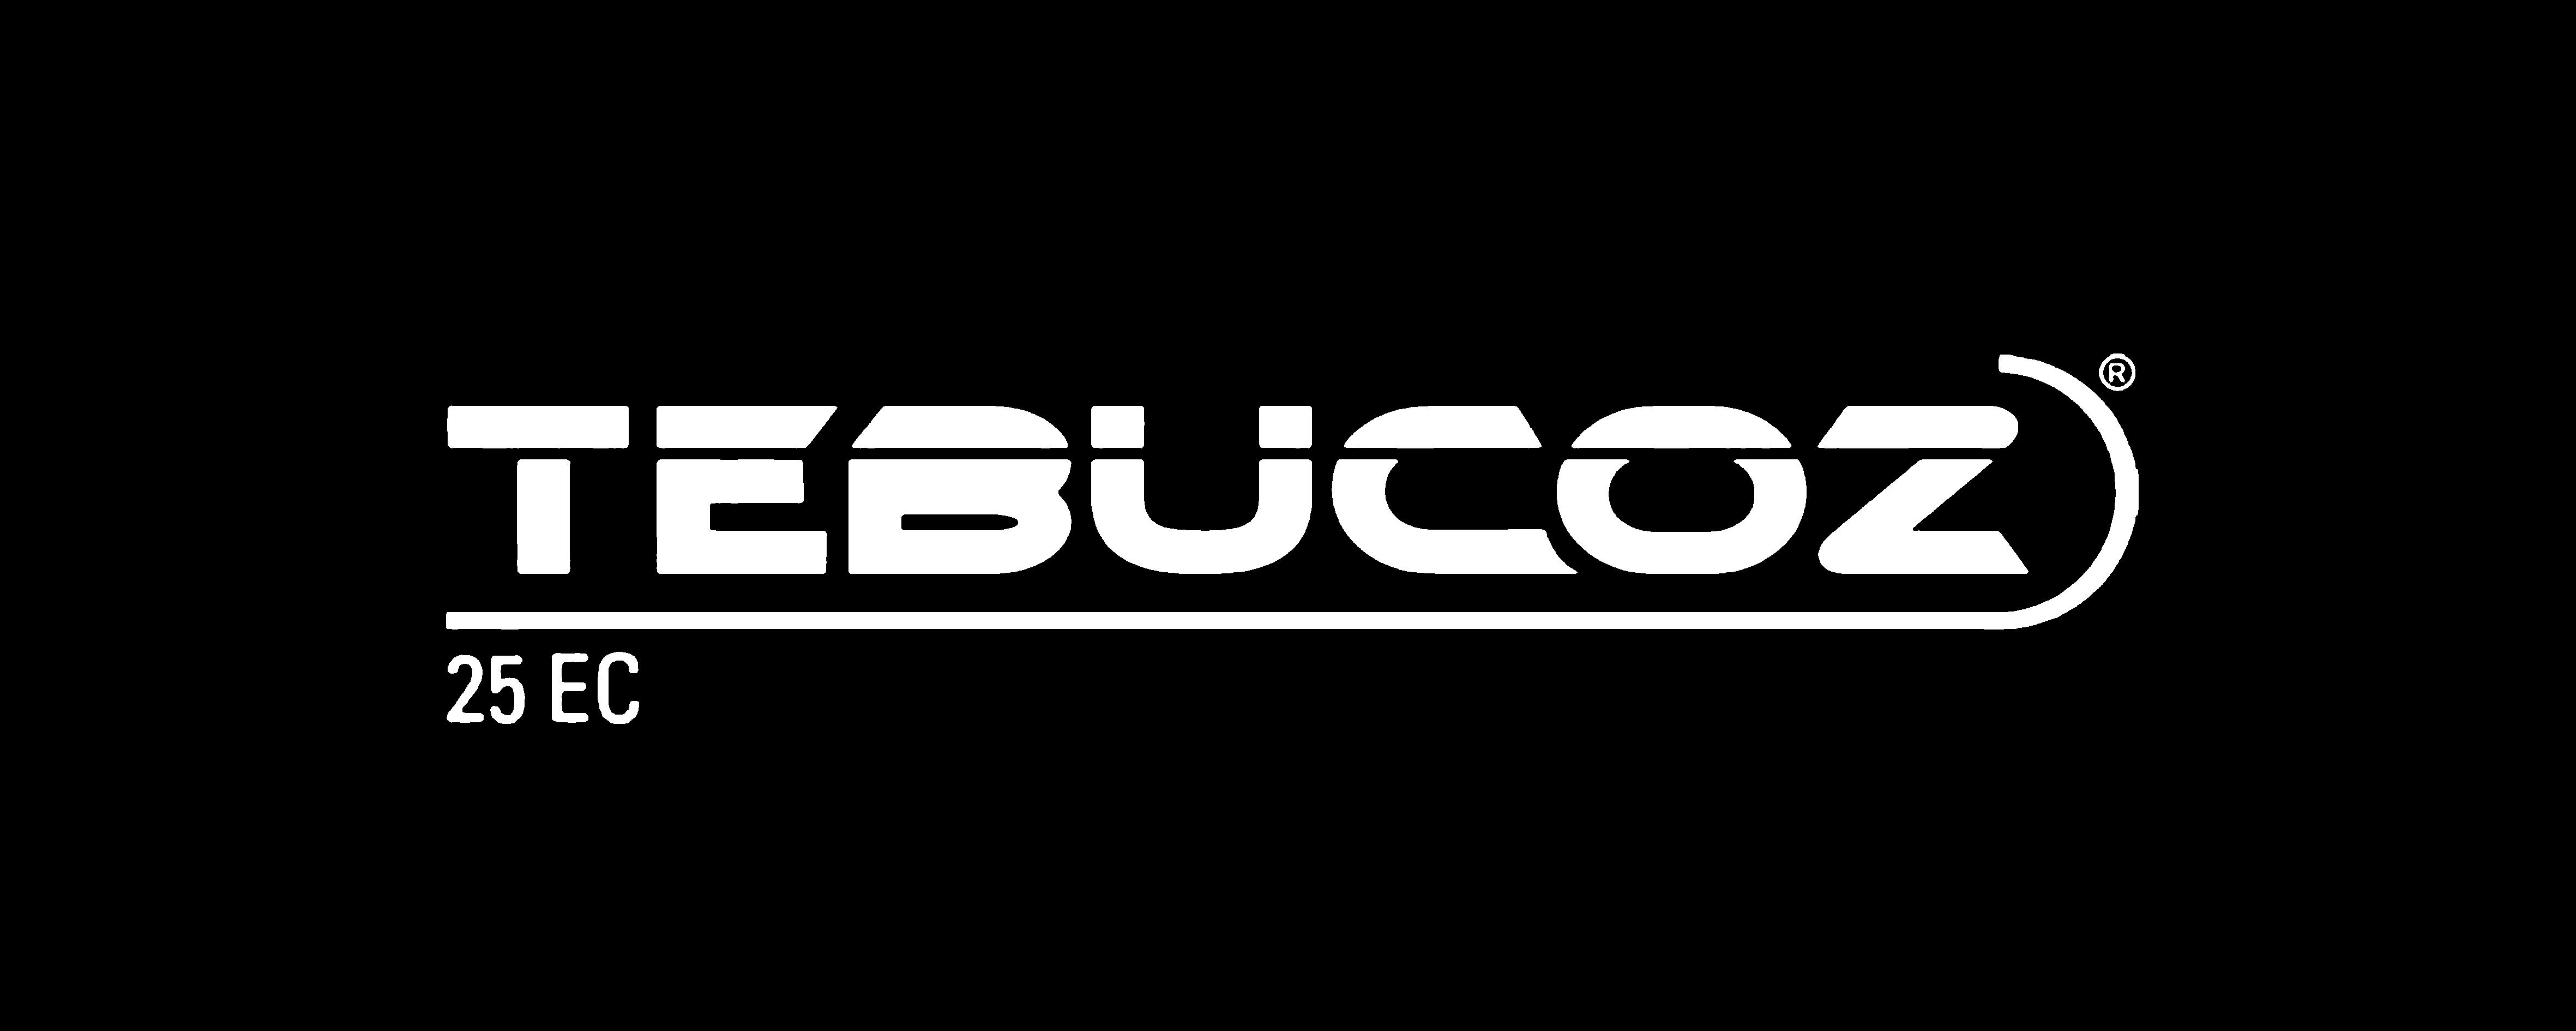 TEBUCOZ-25-EC